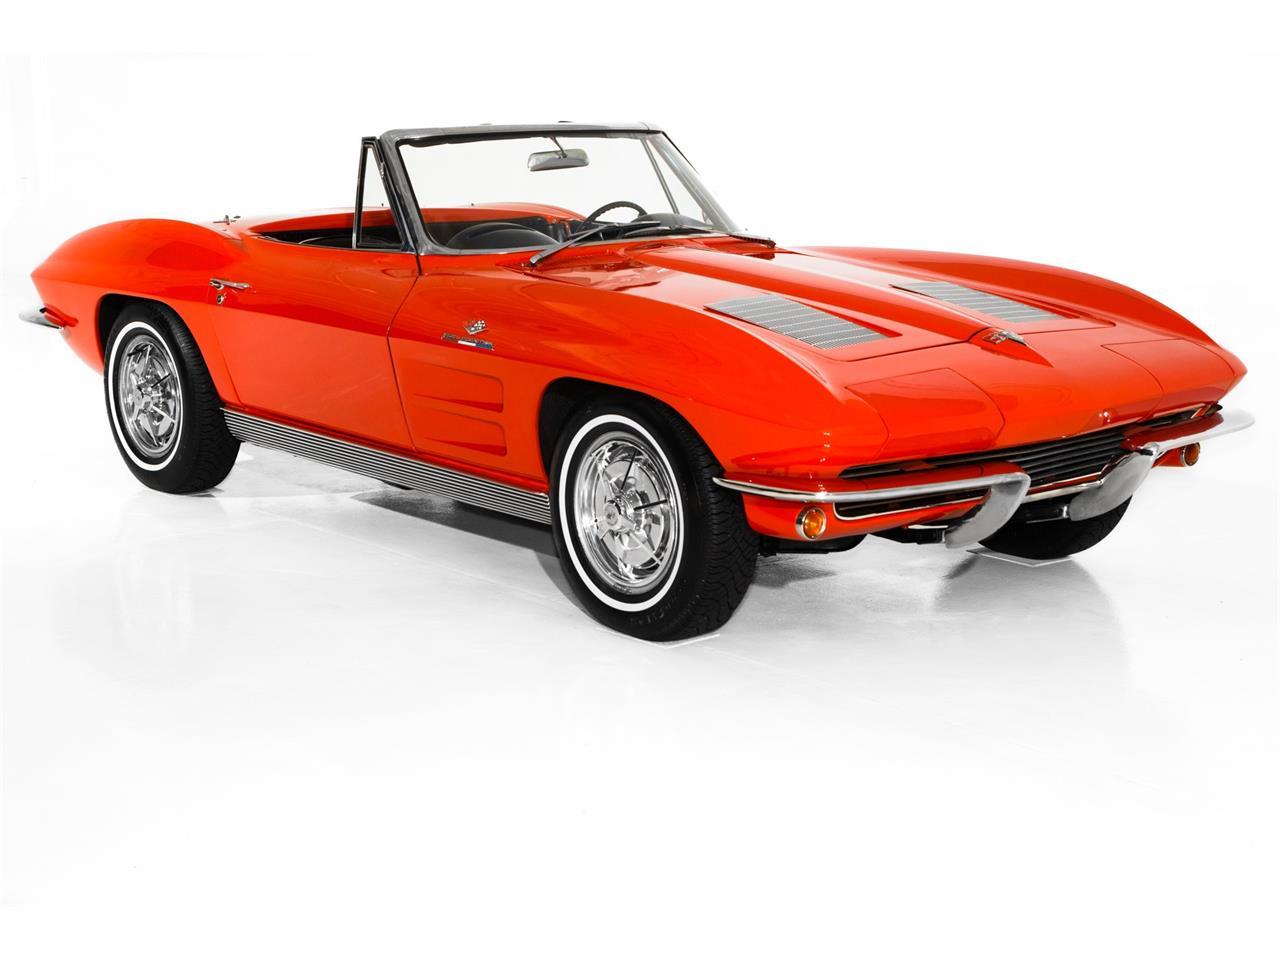 1963 chevrolet corvette for sale cc 1081803. Black Bedroom Furniture Sets. Home Design Ideas